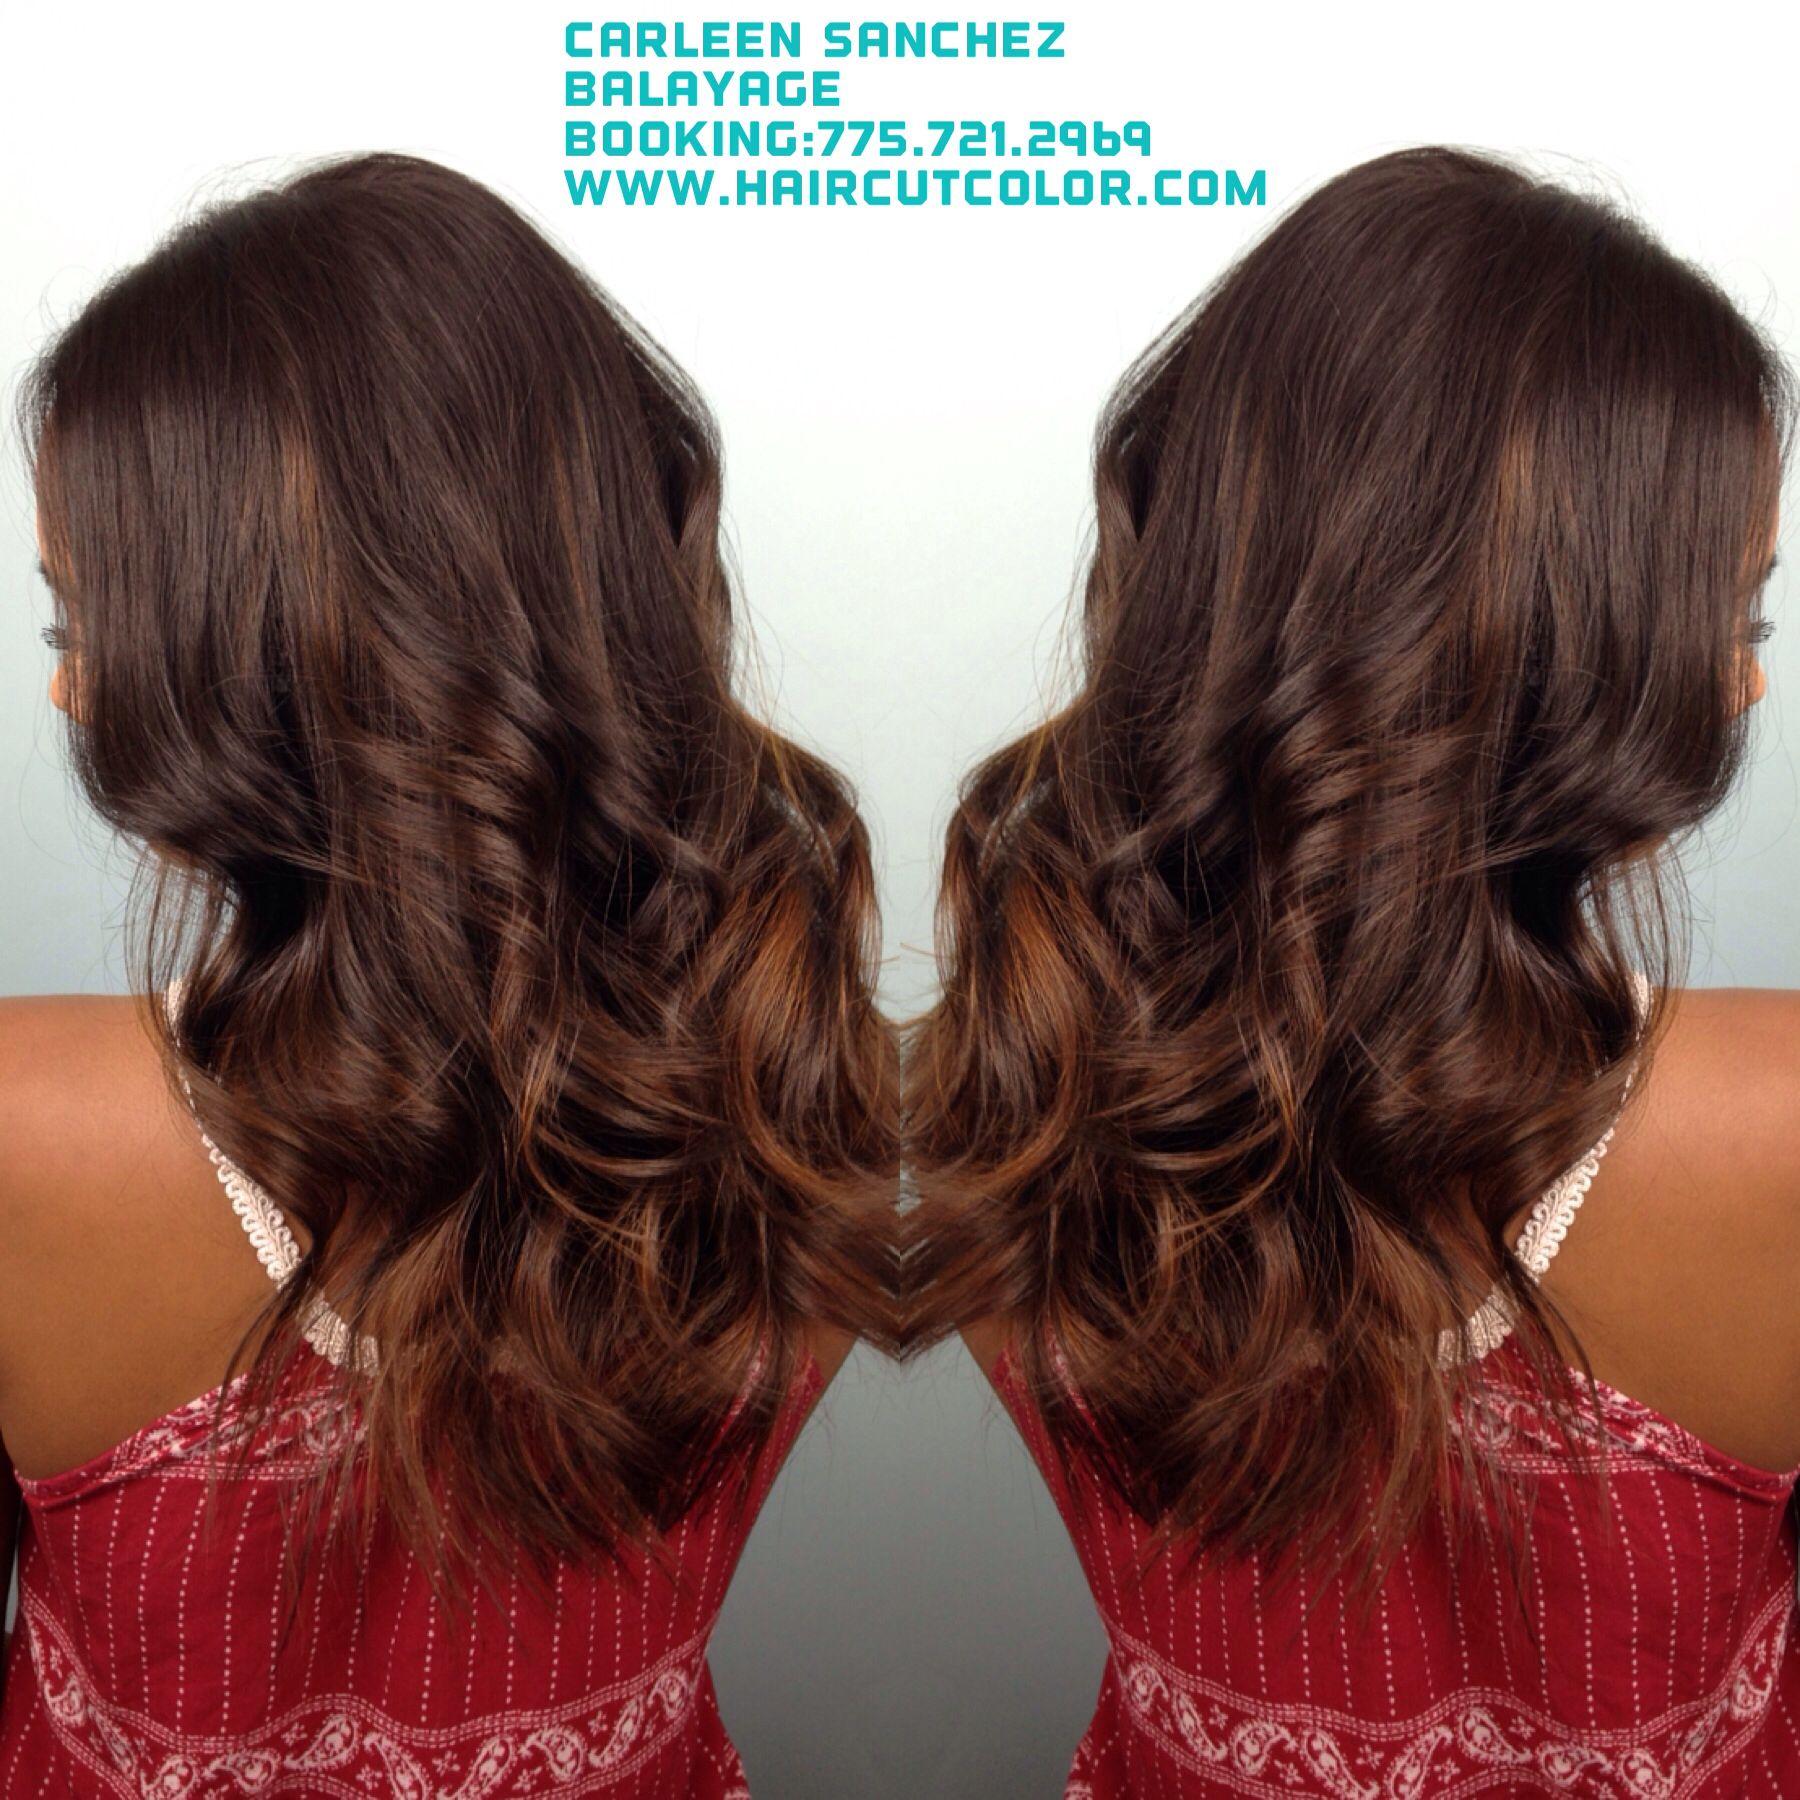 Brunette Balayage by Carleen Sanchez www.haircutcolor.com